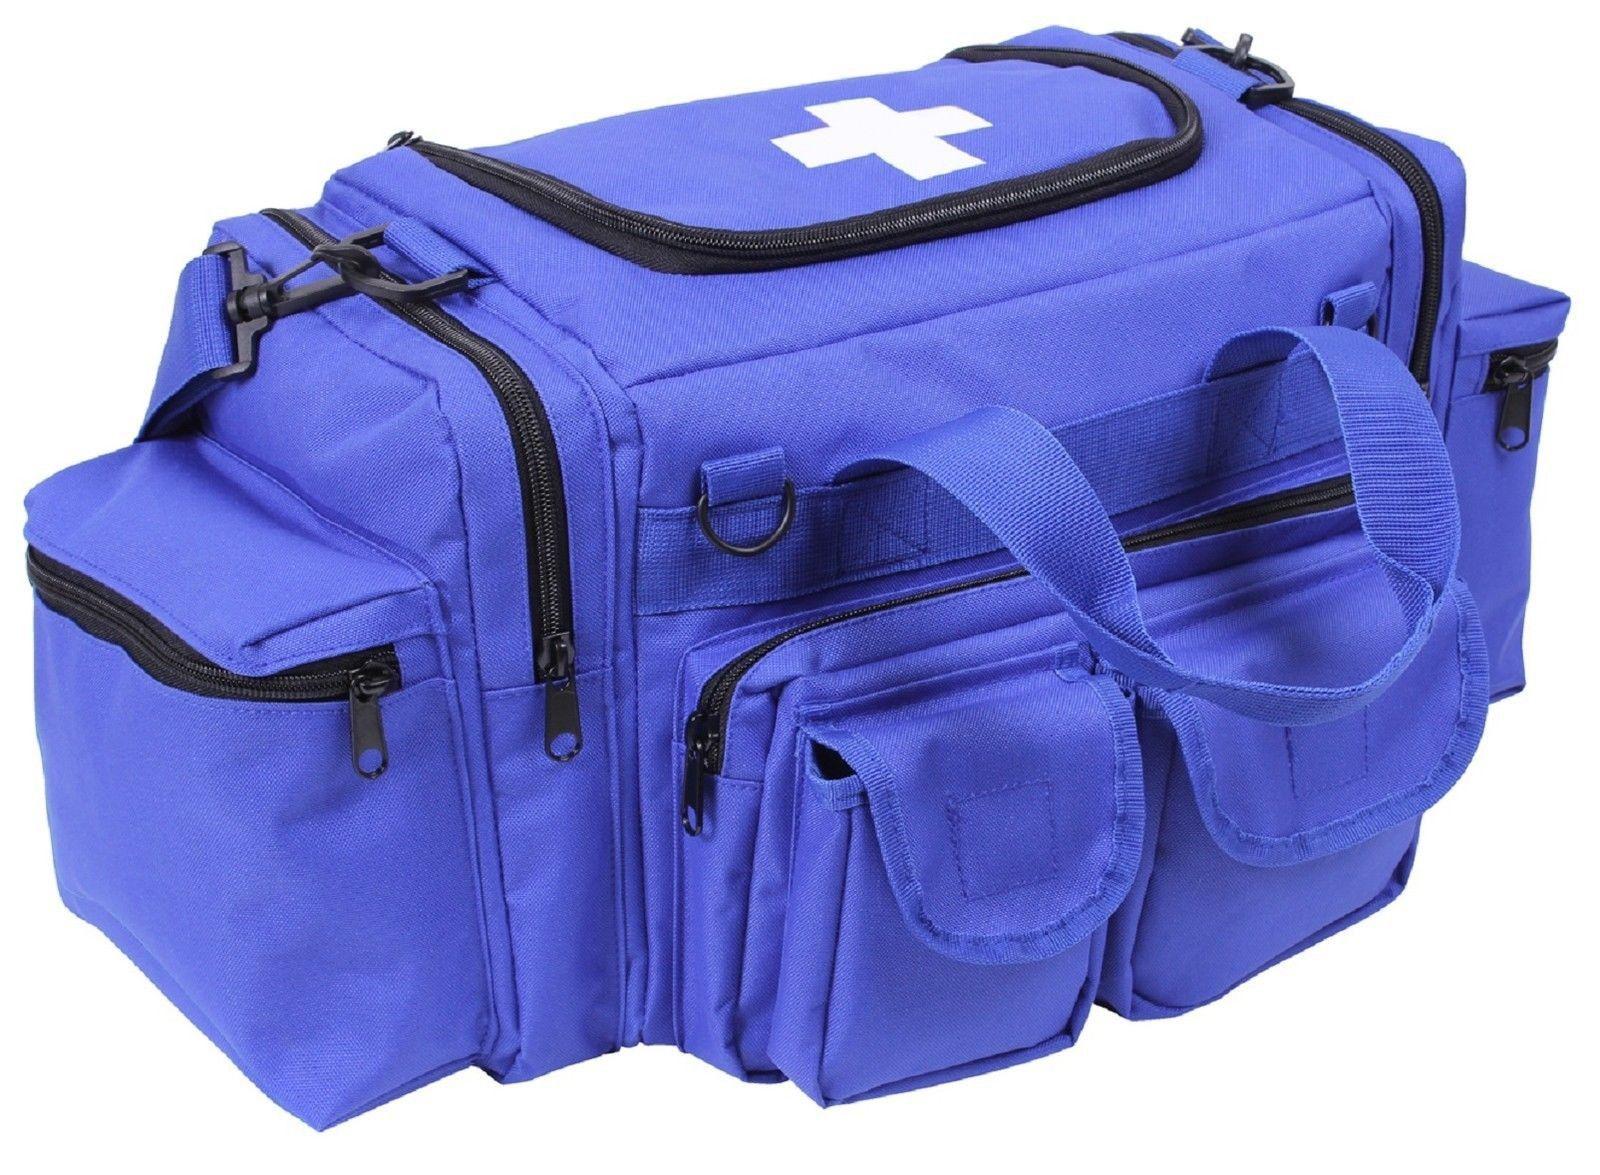 Blue Emt Field Bag W Cross Rothco 22 6 Pocket Medic